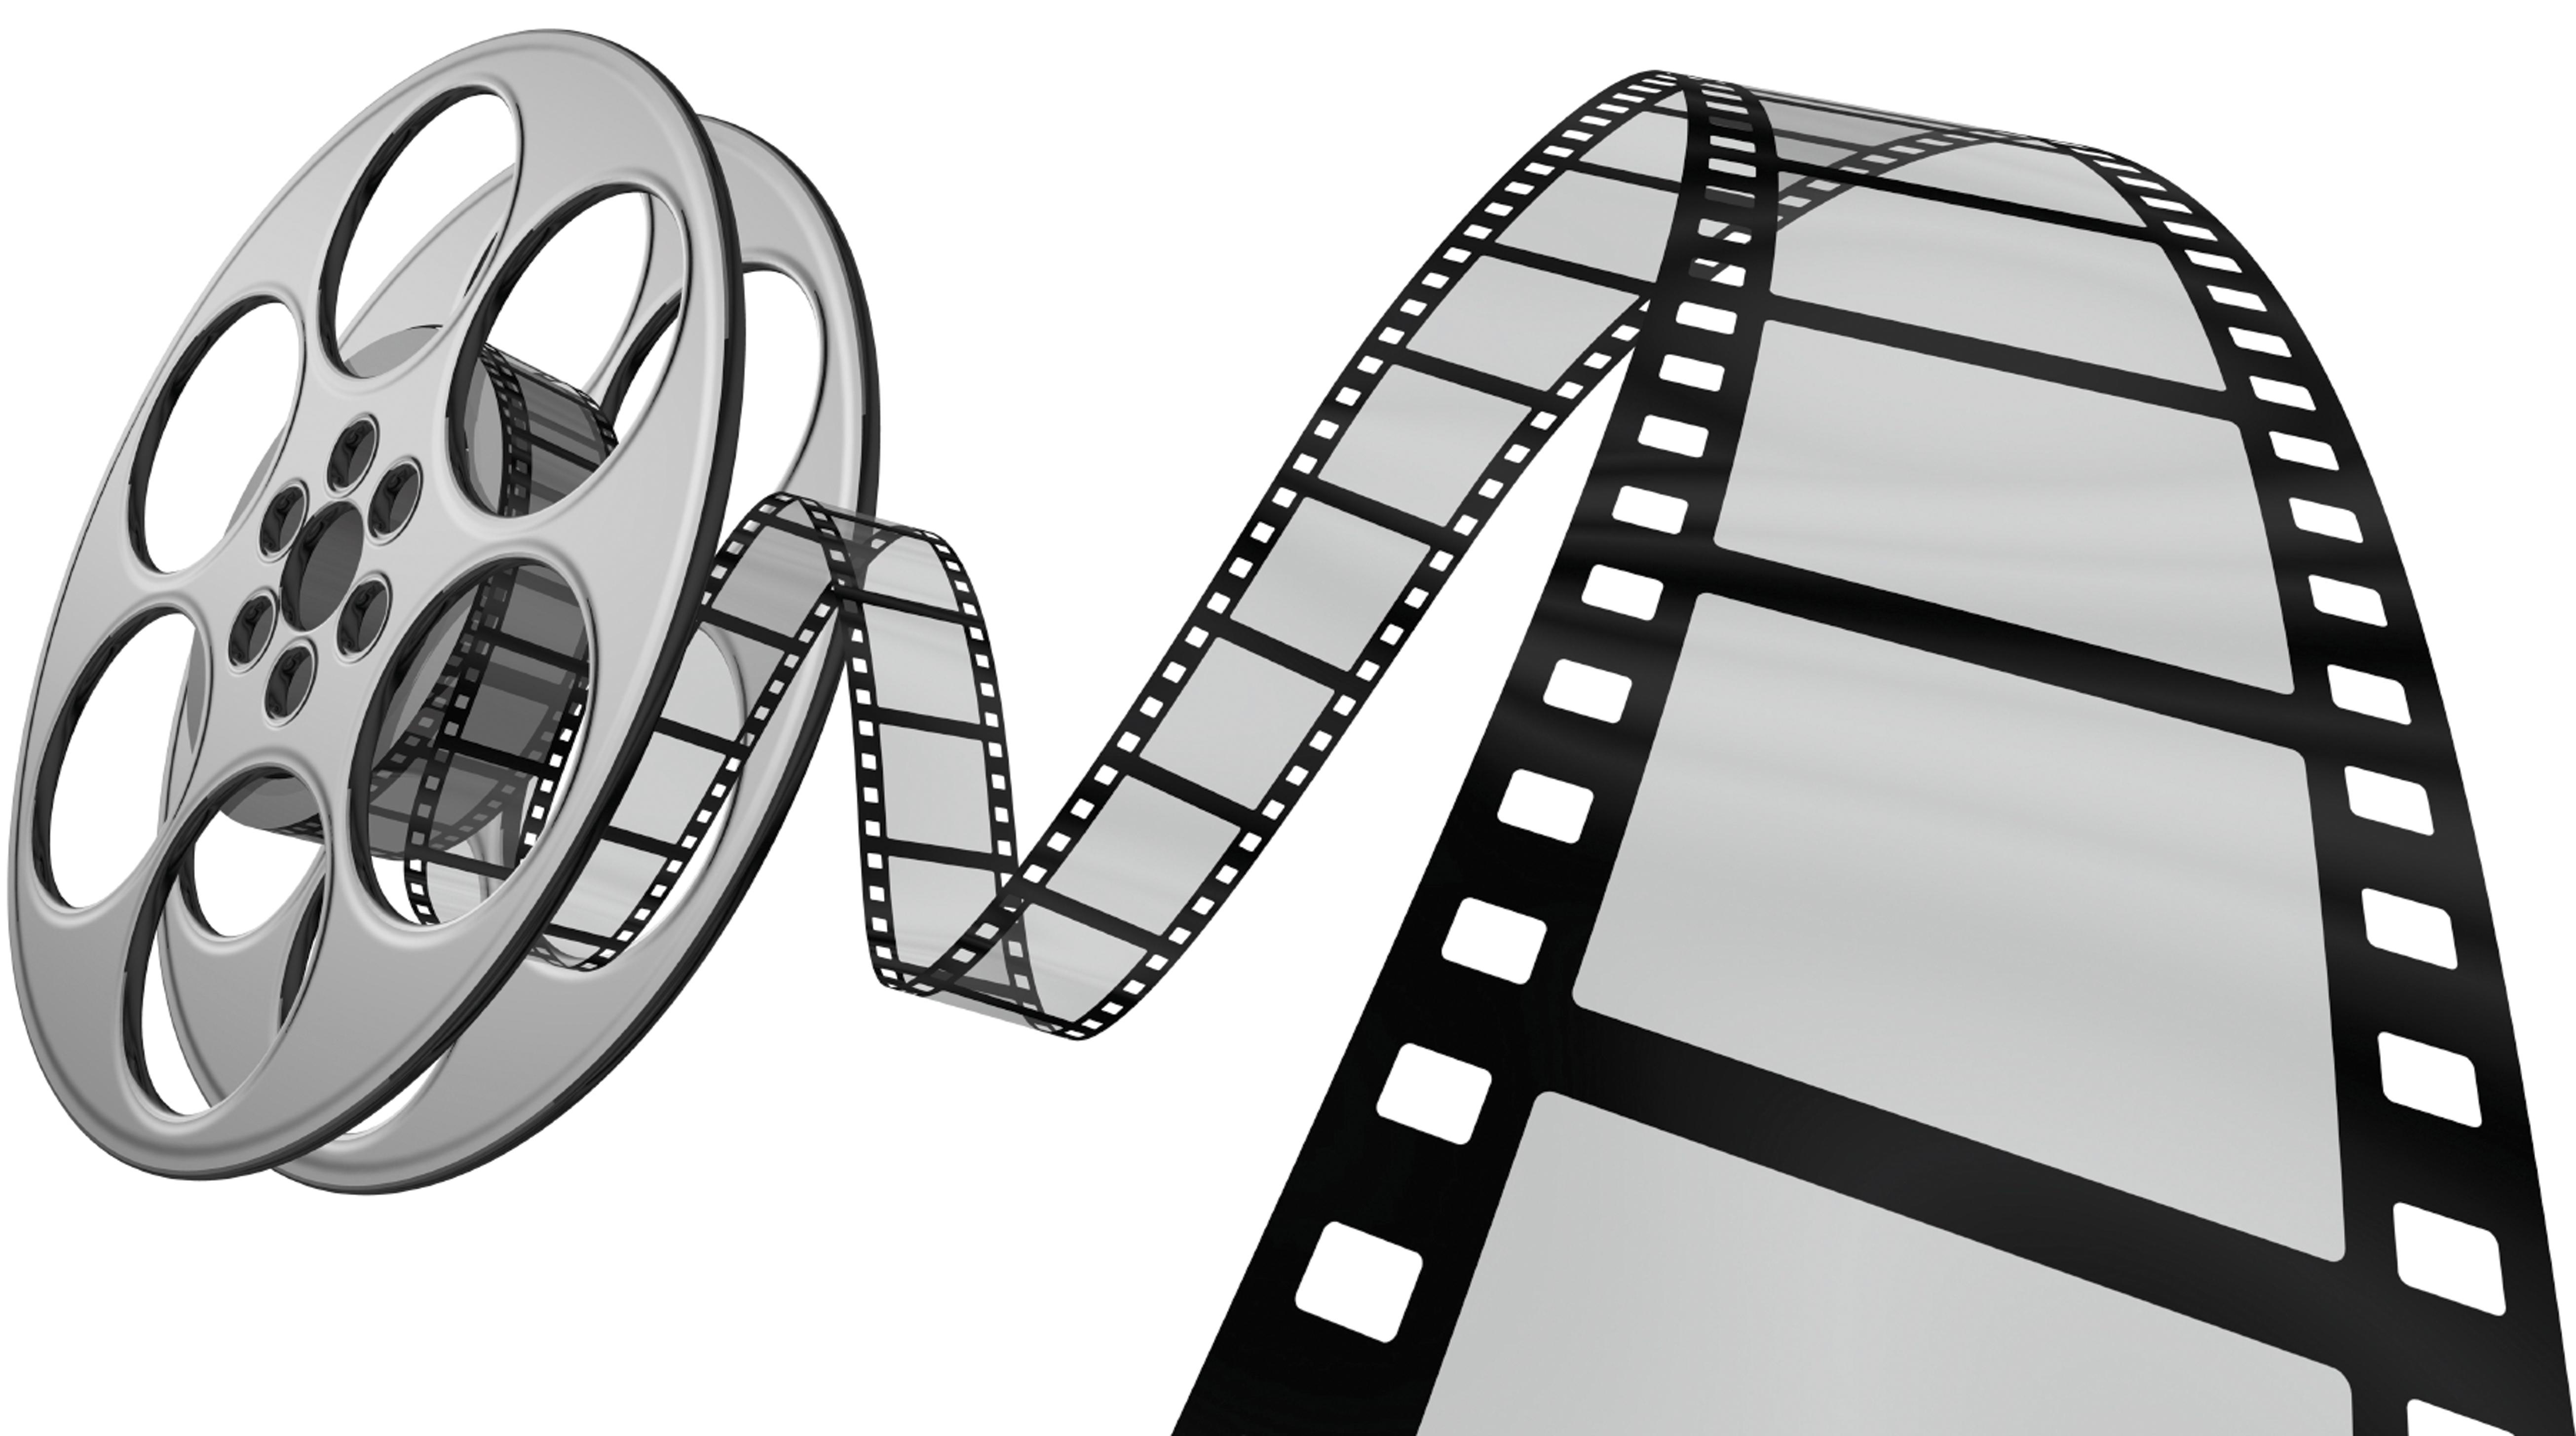 Free download clip art. Cinema clipart film screening